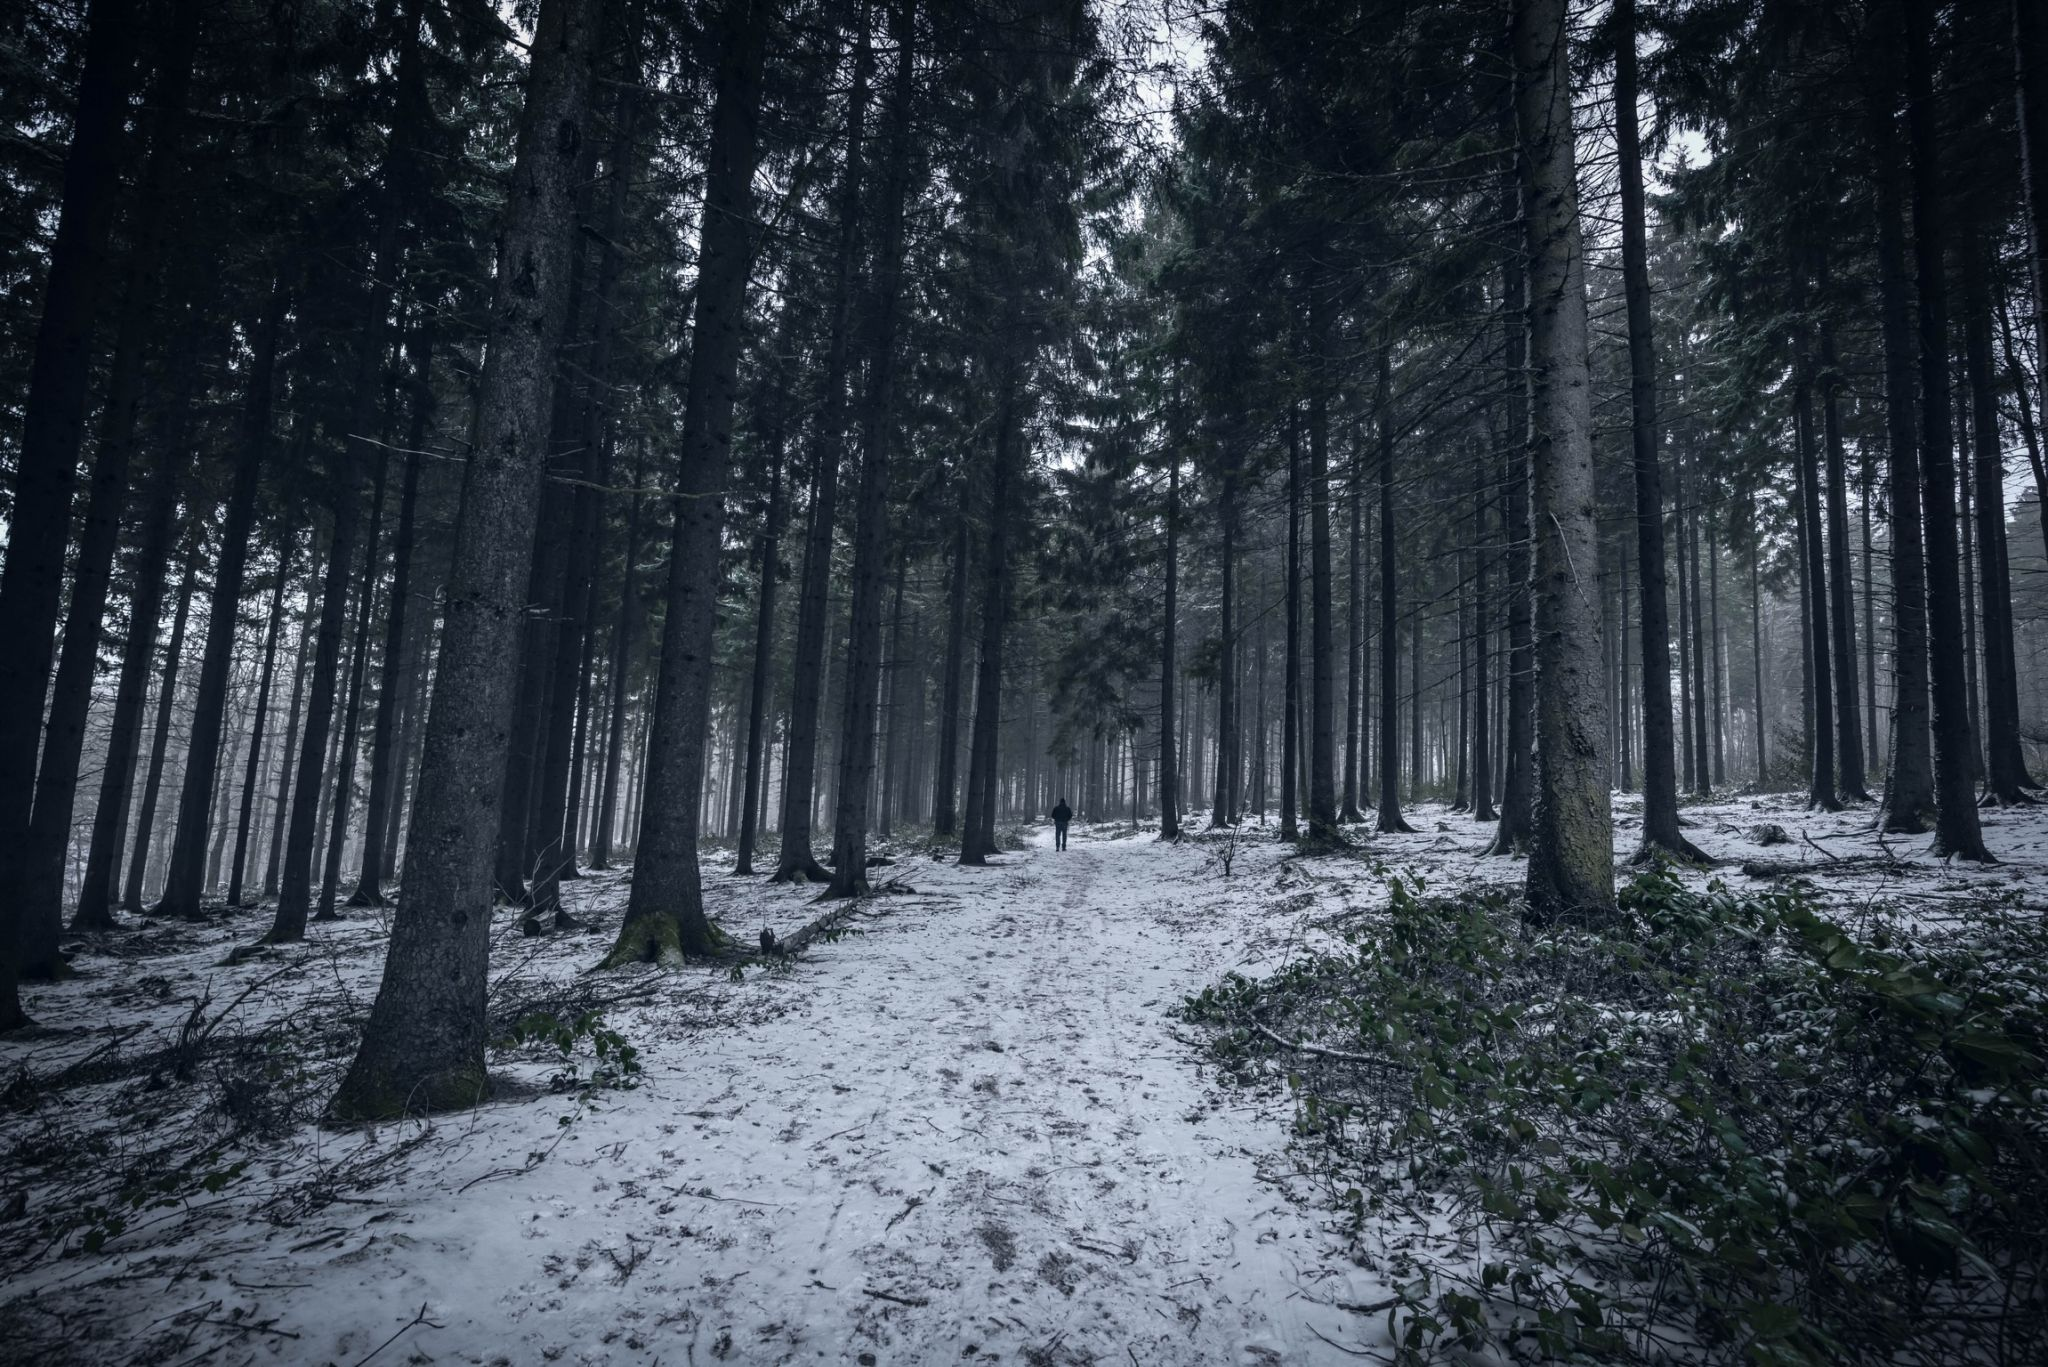 Cronenberg Forest, Germany